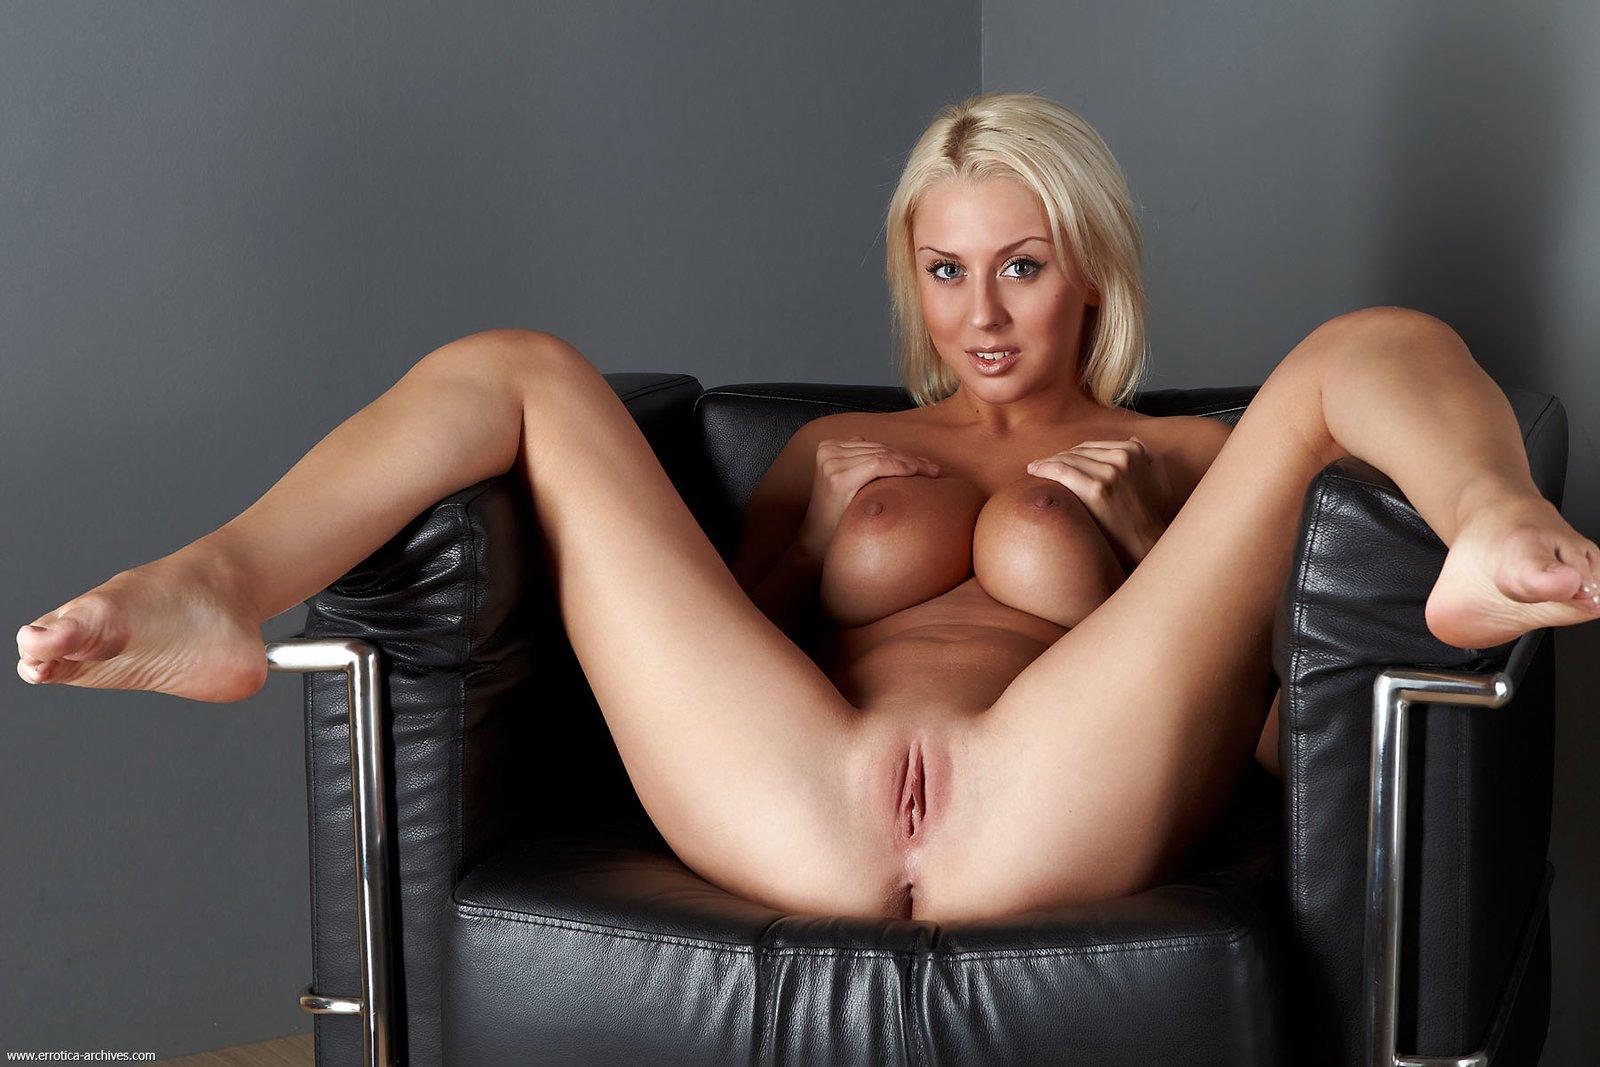 amanda-knox-fake-nudes-twins-and-sexual-orientation